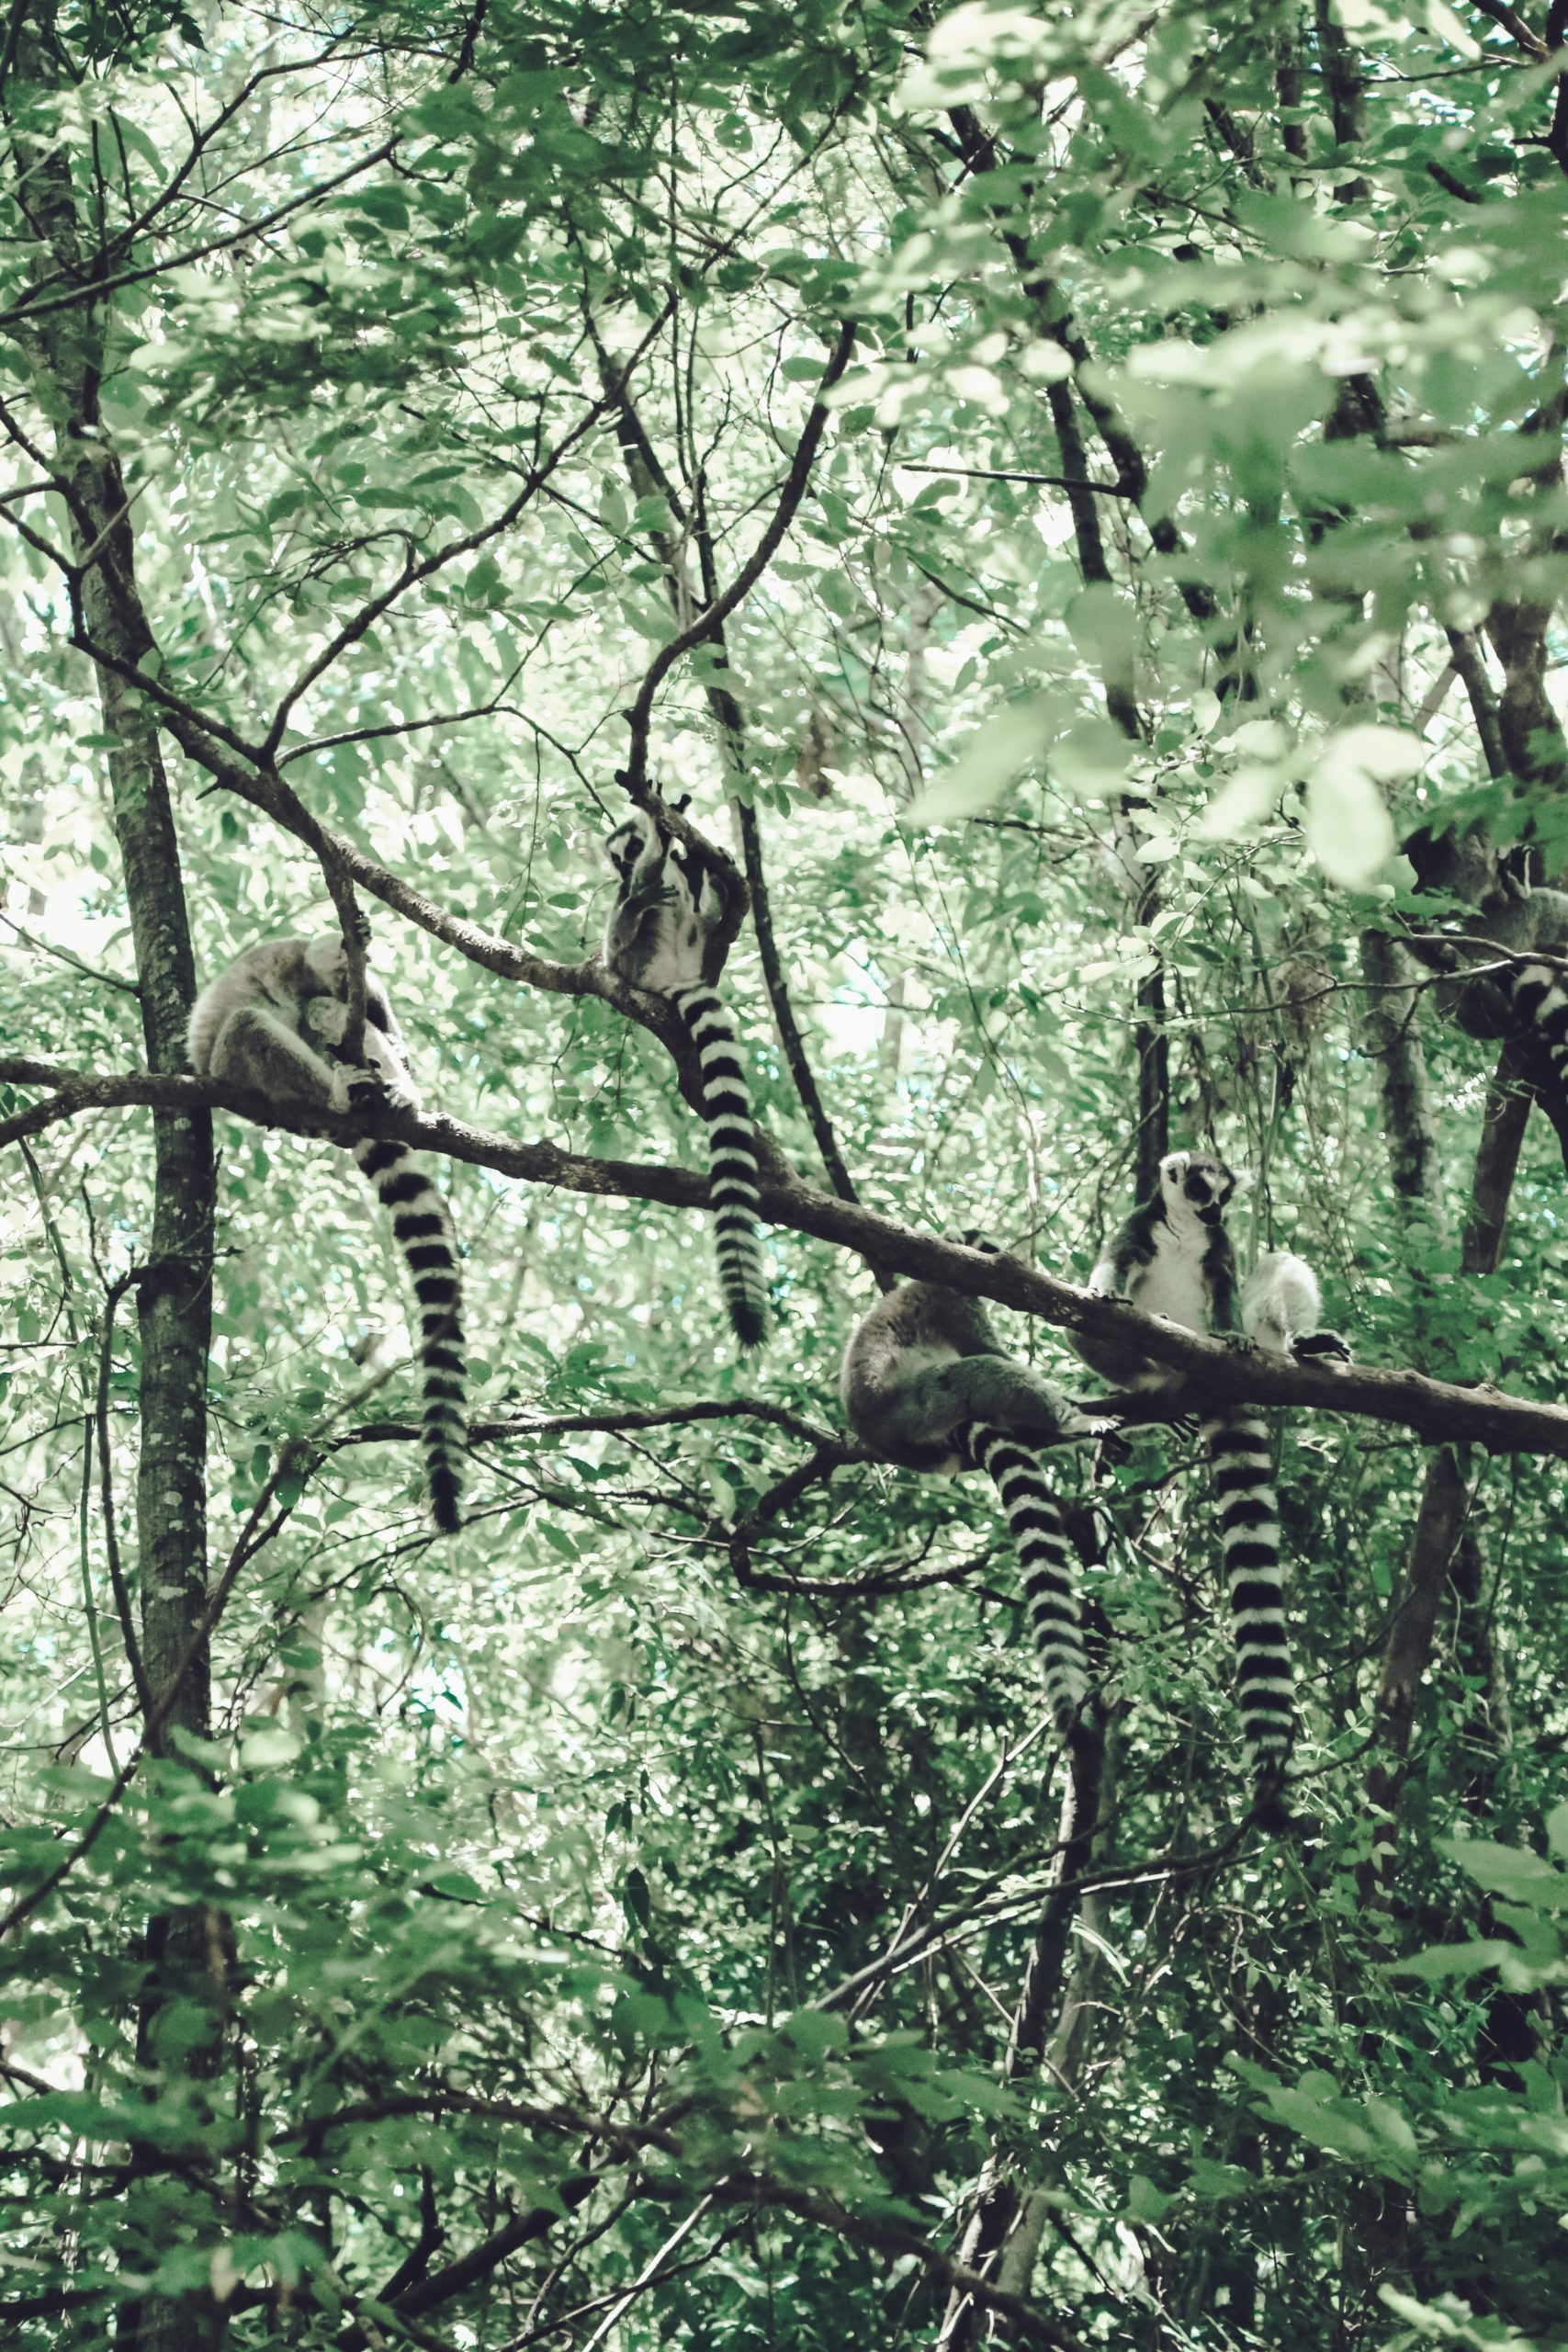 sugar gliders on tree branch during daytime